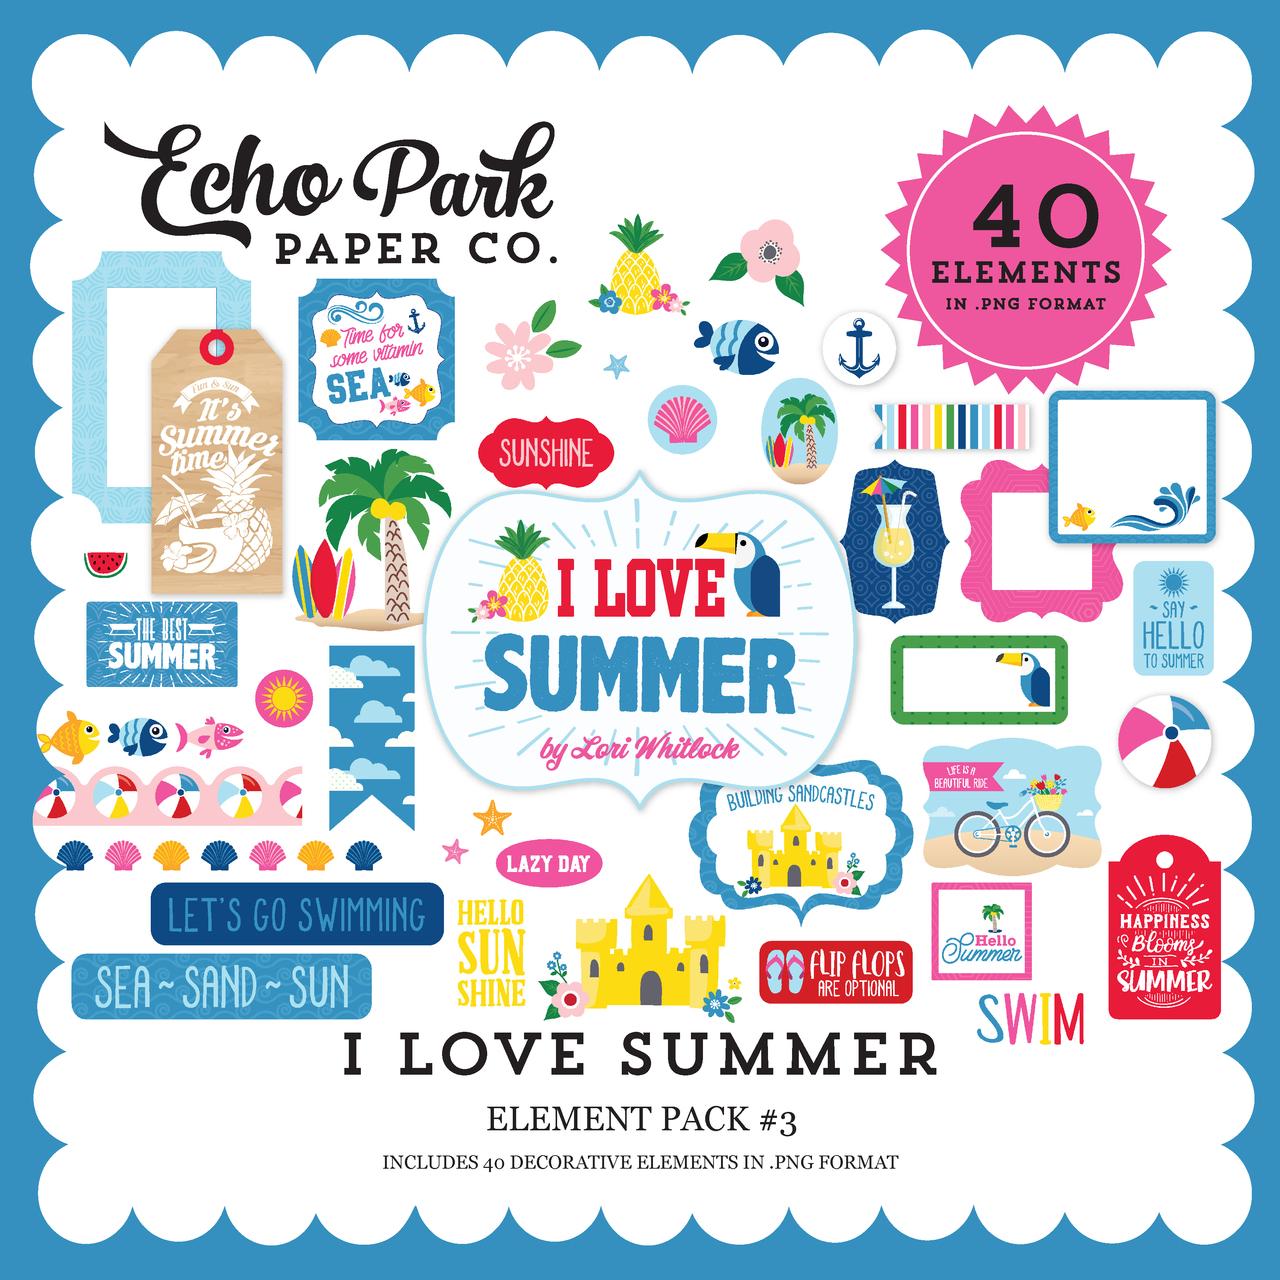 I Love Summer Element Pack #3